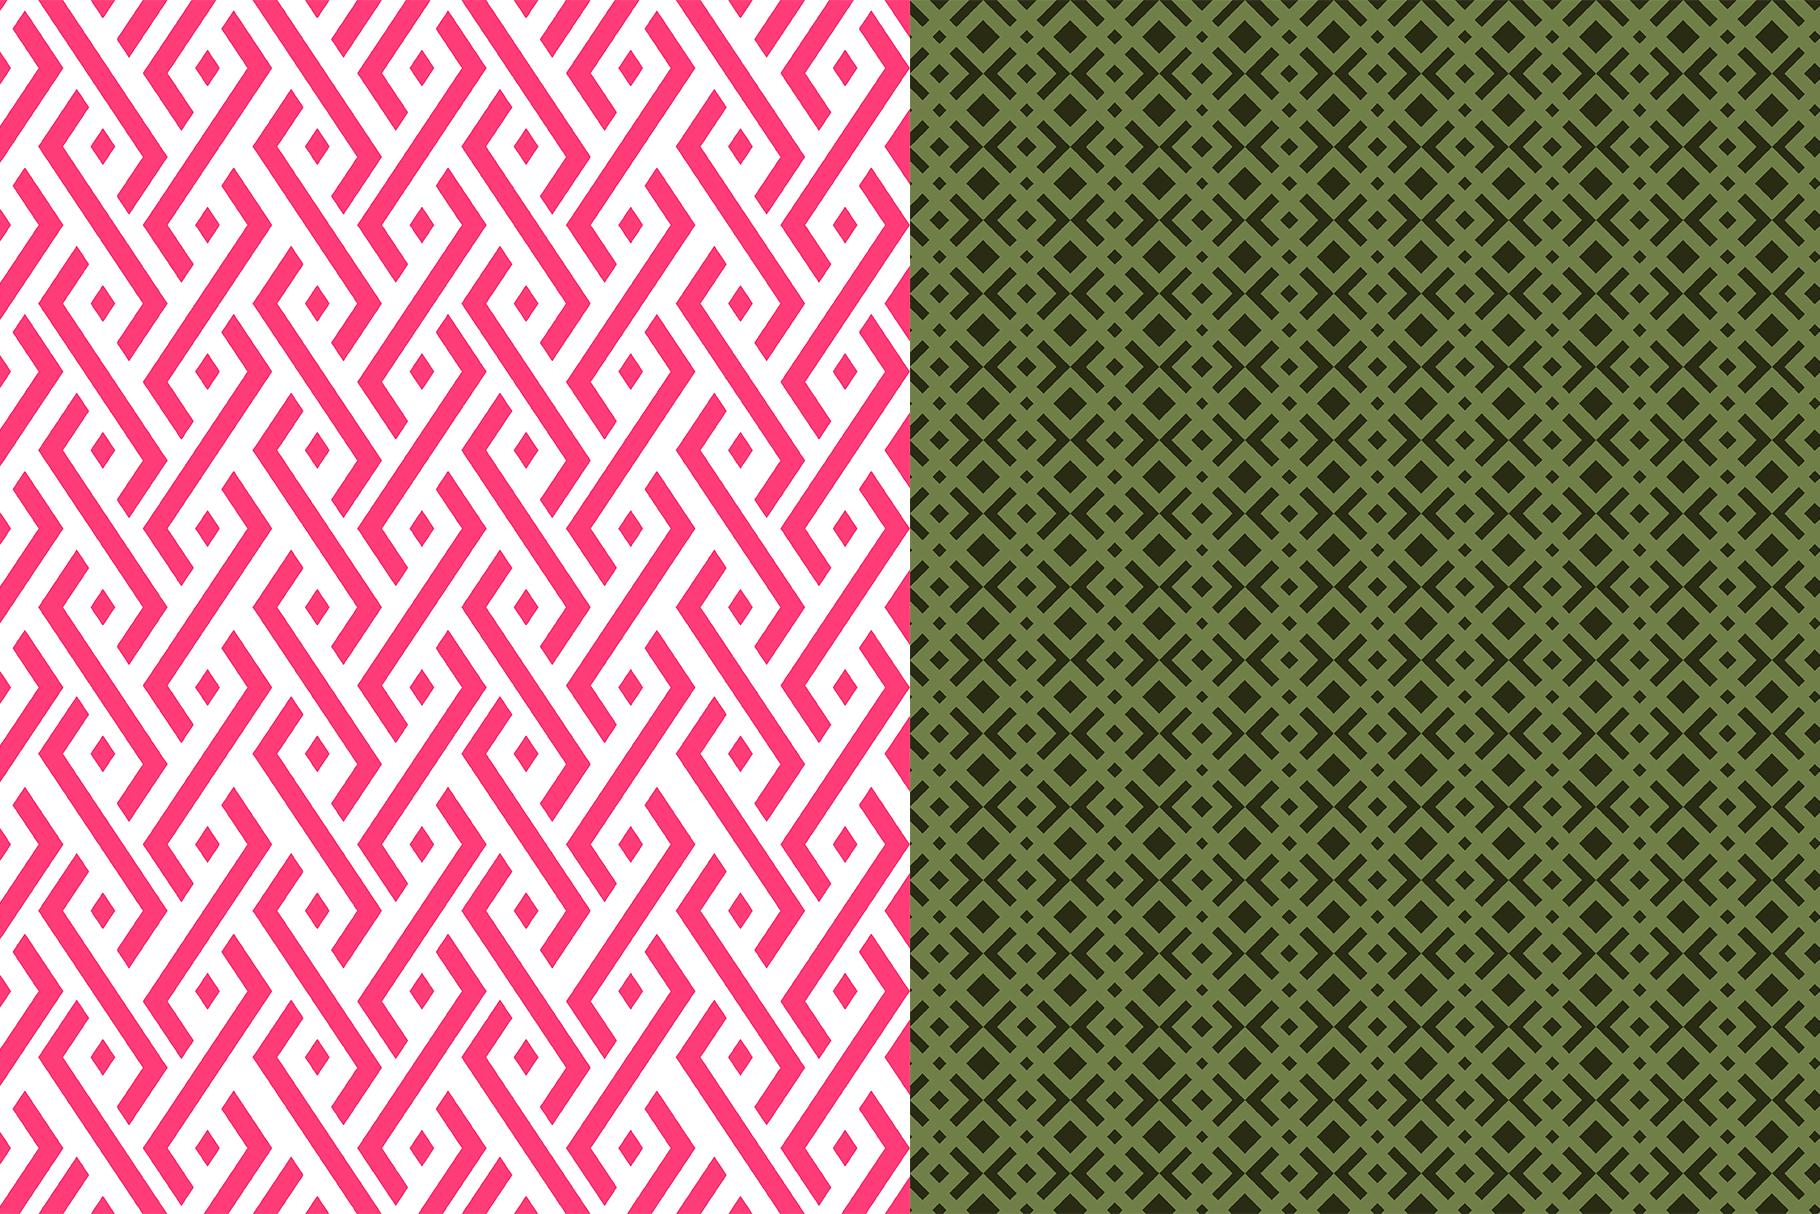 10 Geometric and Liquid Pattern example image 6